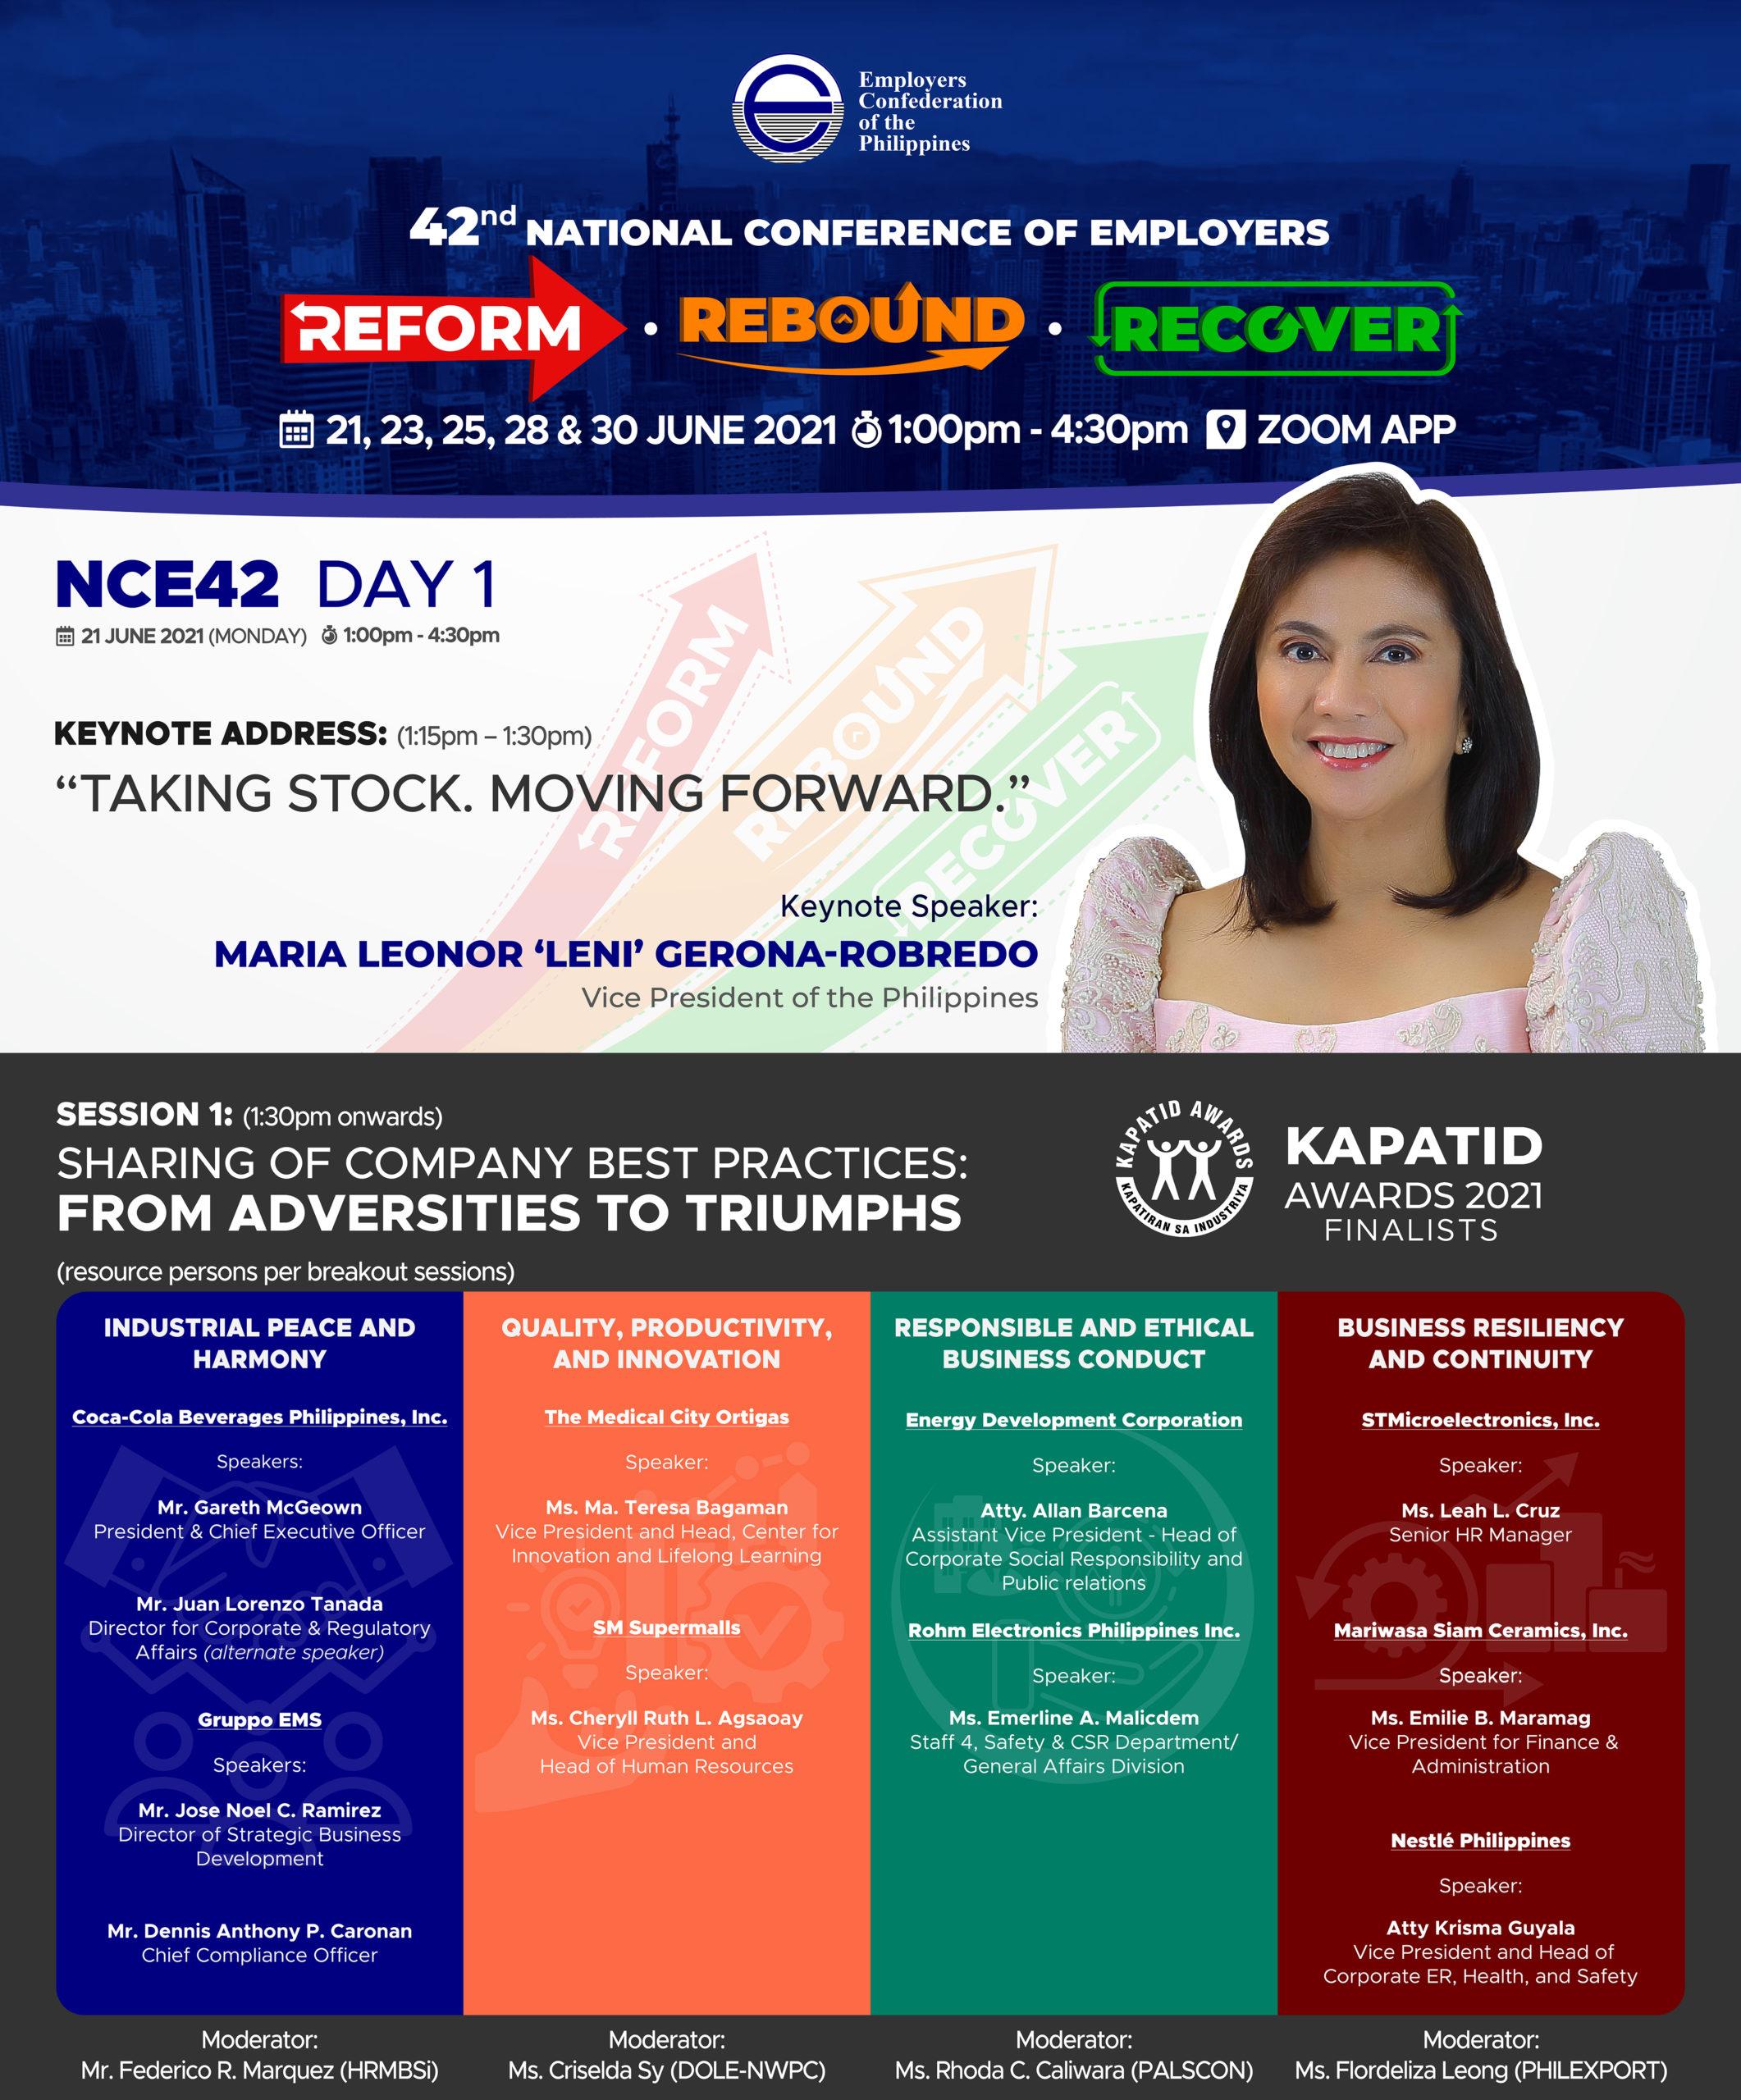 NCE42 (DAY 1) Opening Keynote Address